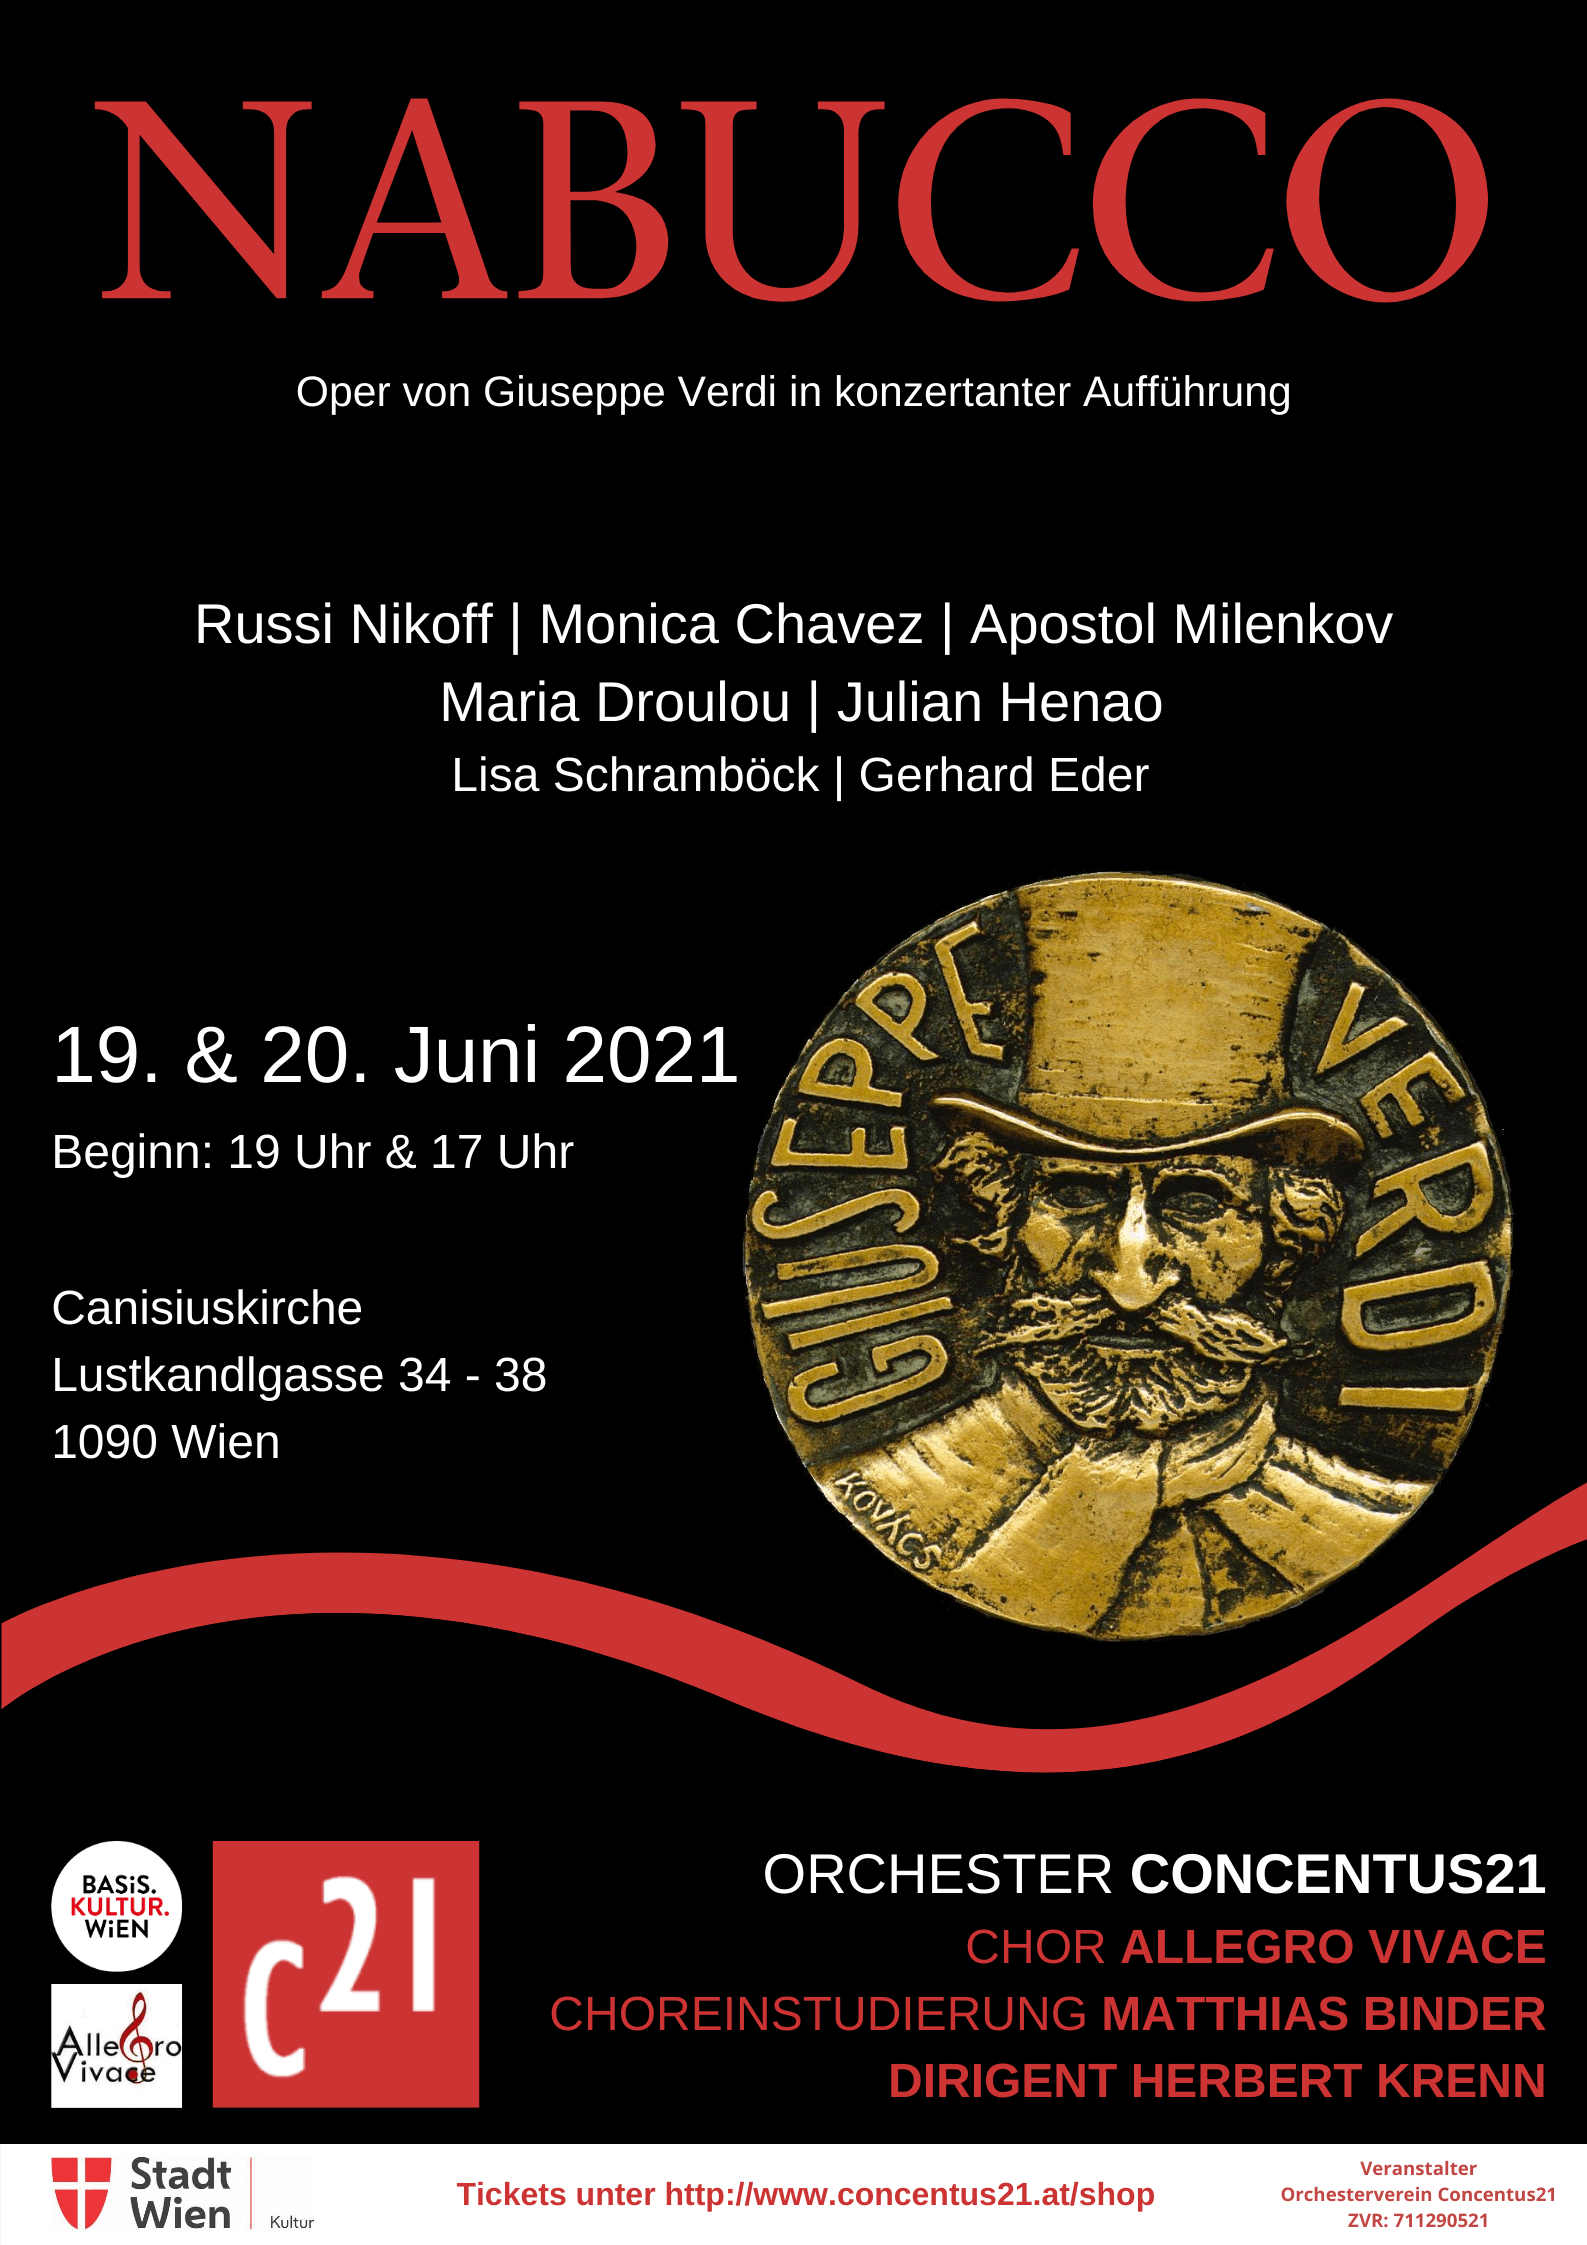 Plakat Opernprojekt Nabucco 2021